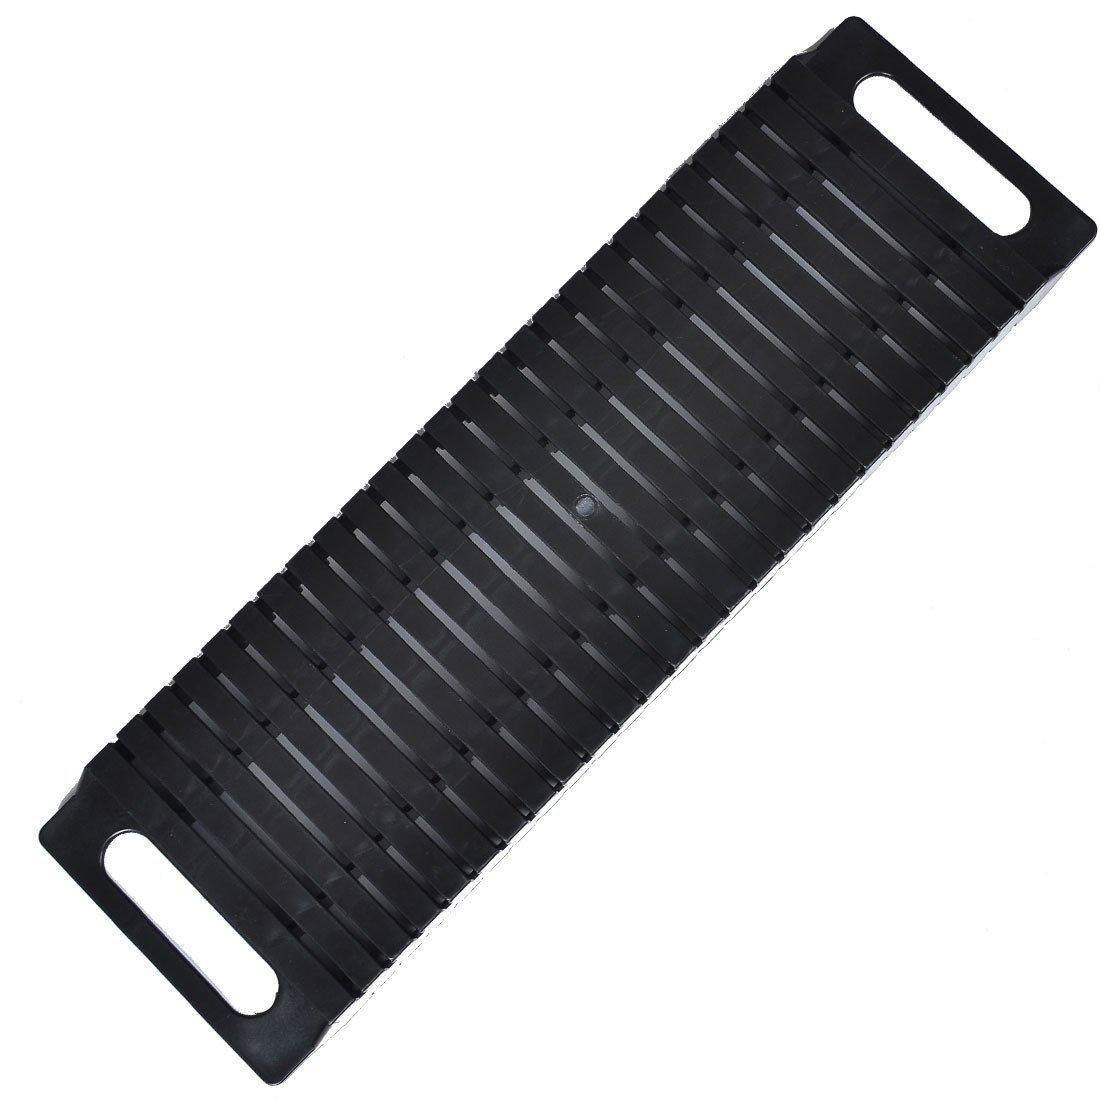 Antistatic ESD Circulation Rack Shelf - Sanbo Black Rack with Plastic Material 47 x 14 x 3.5cm by Sanbo